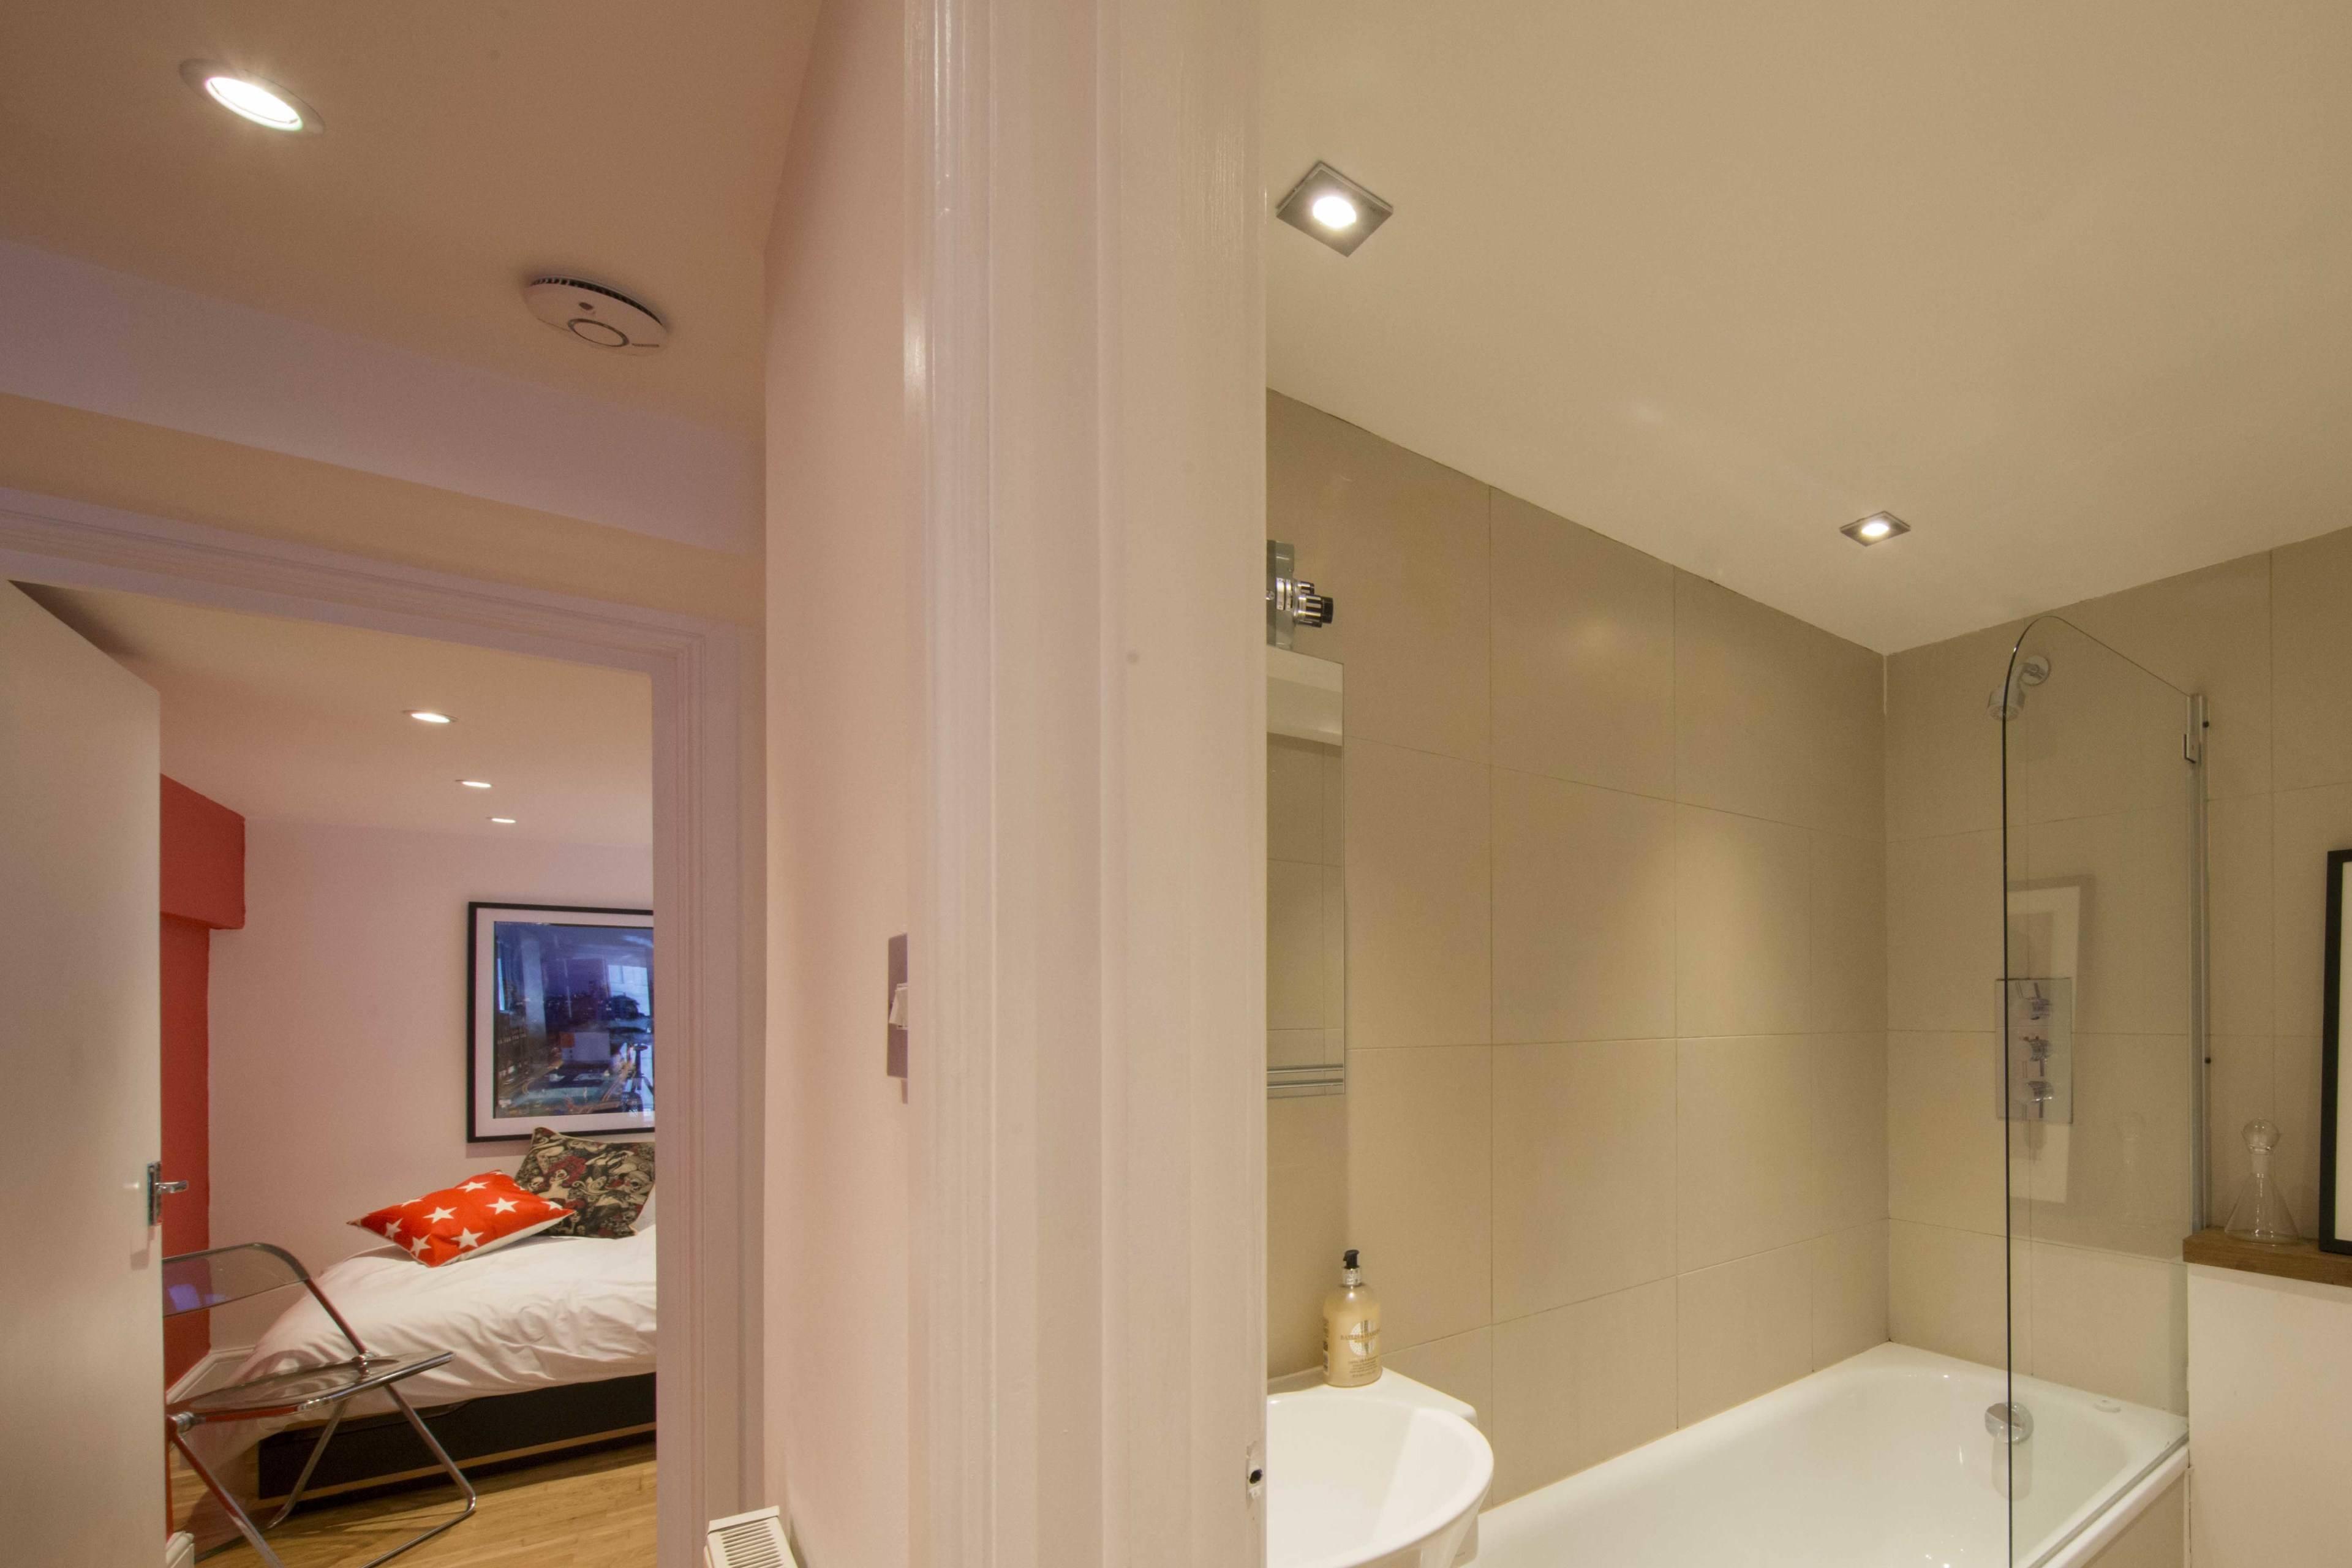 BathroomBedroom001.jpg